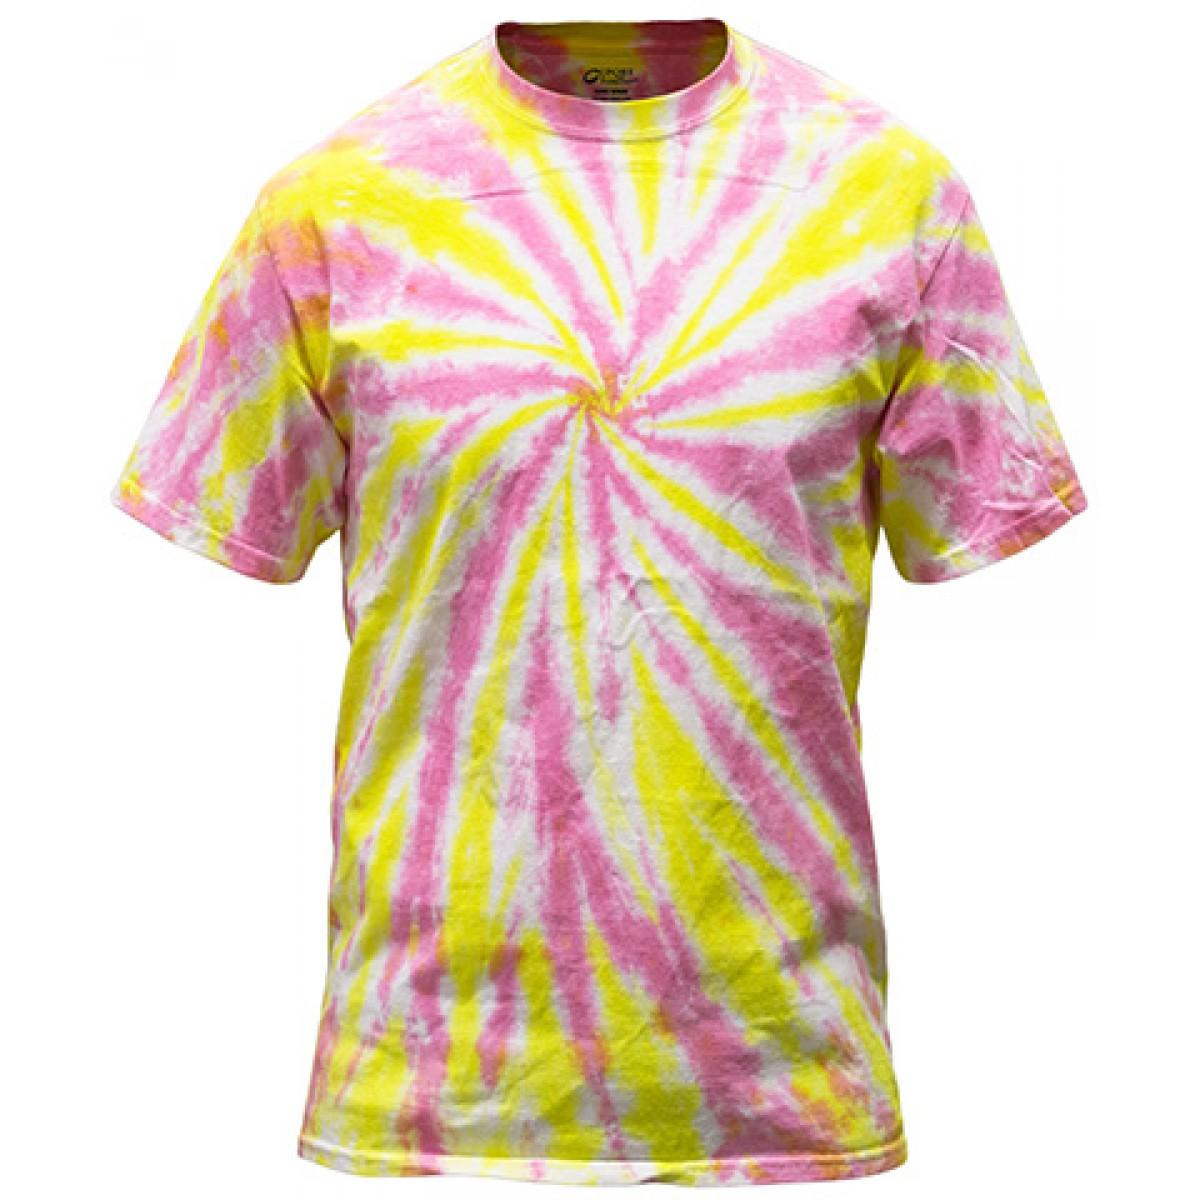 Multi-Color Tie-Dye Tee -Pink/Yellow-2XL